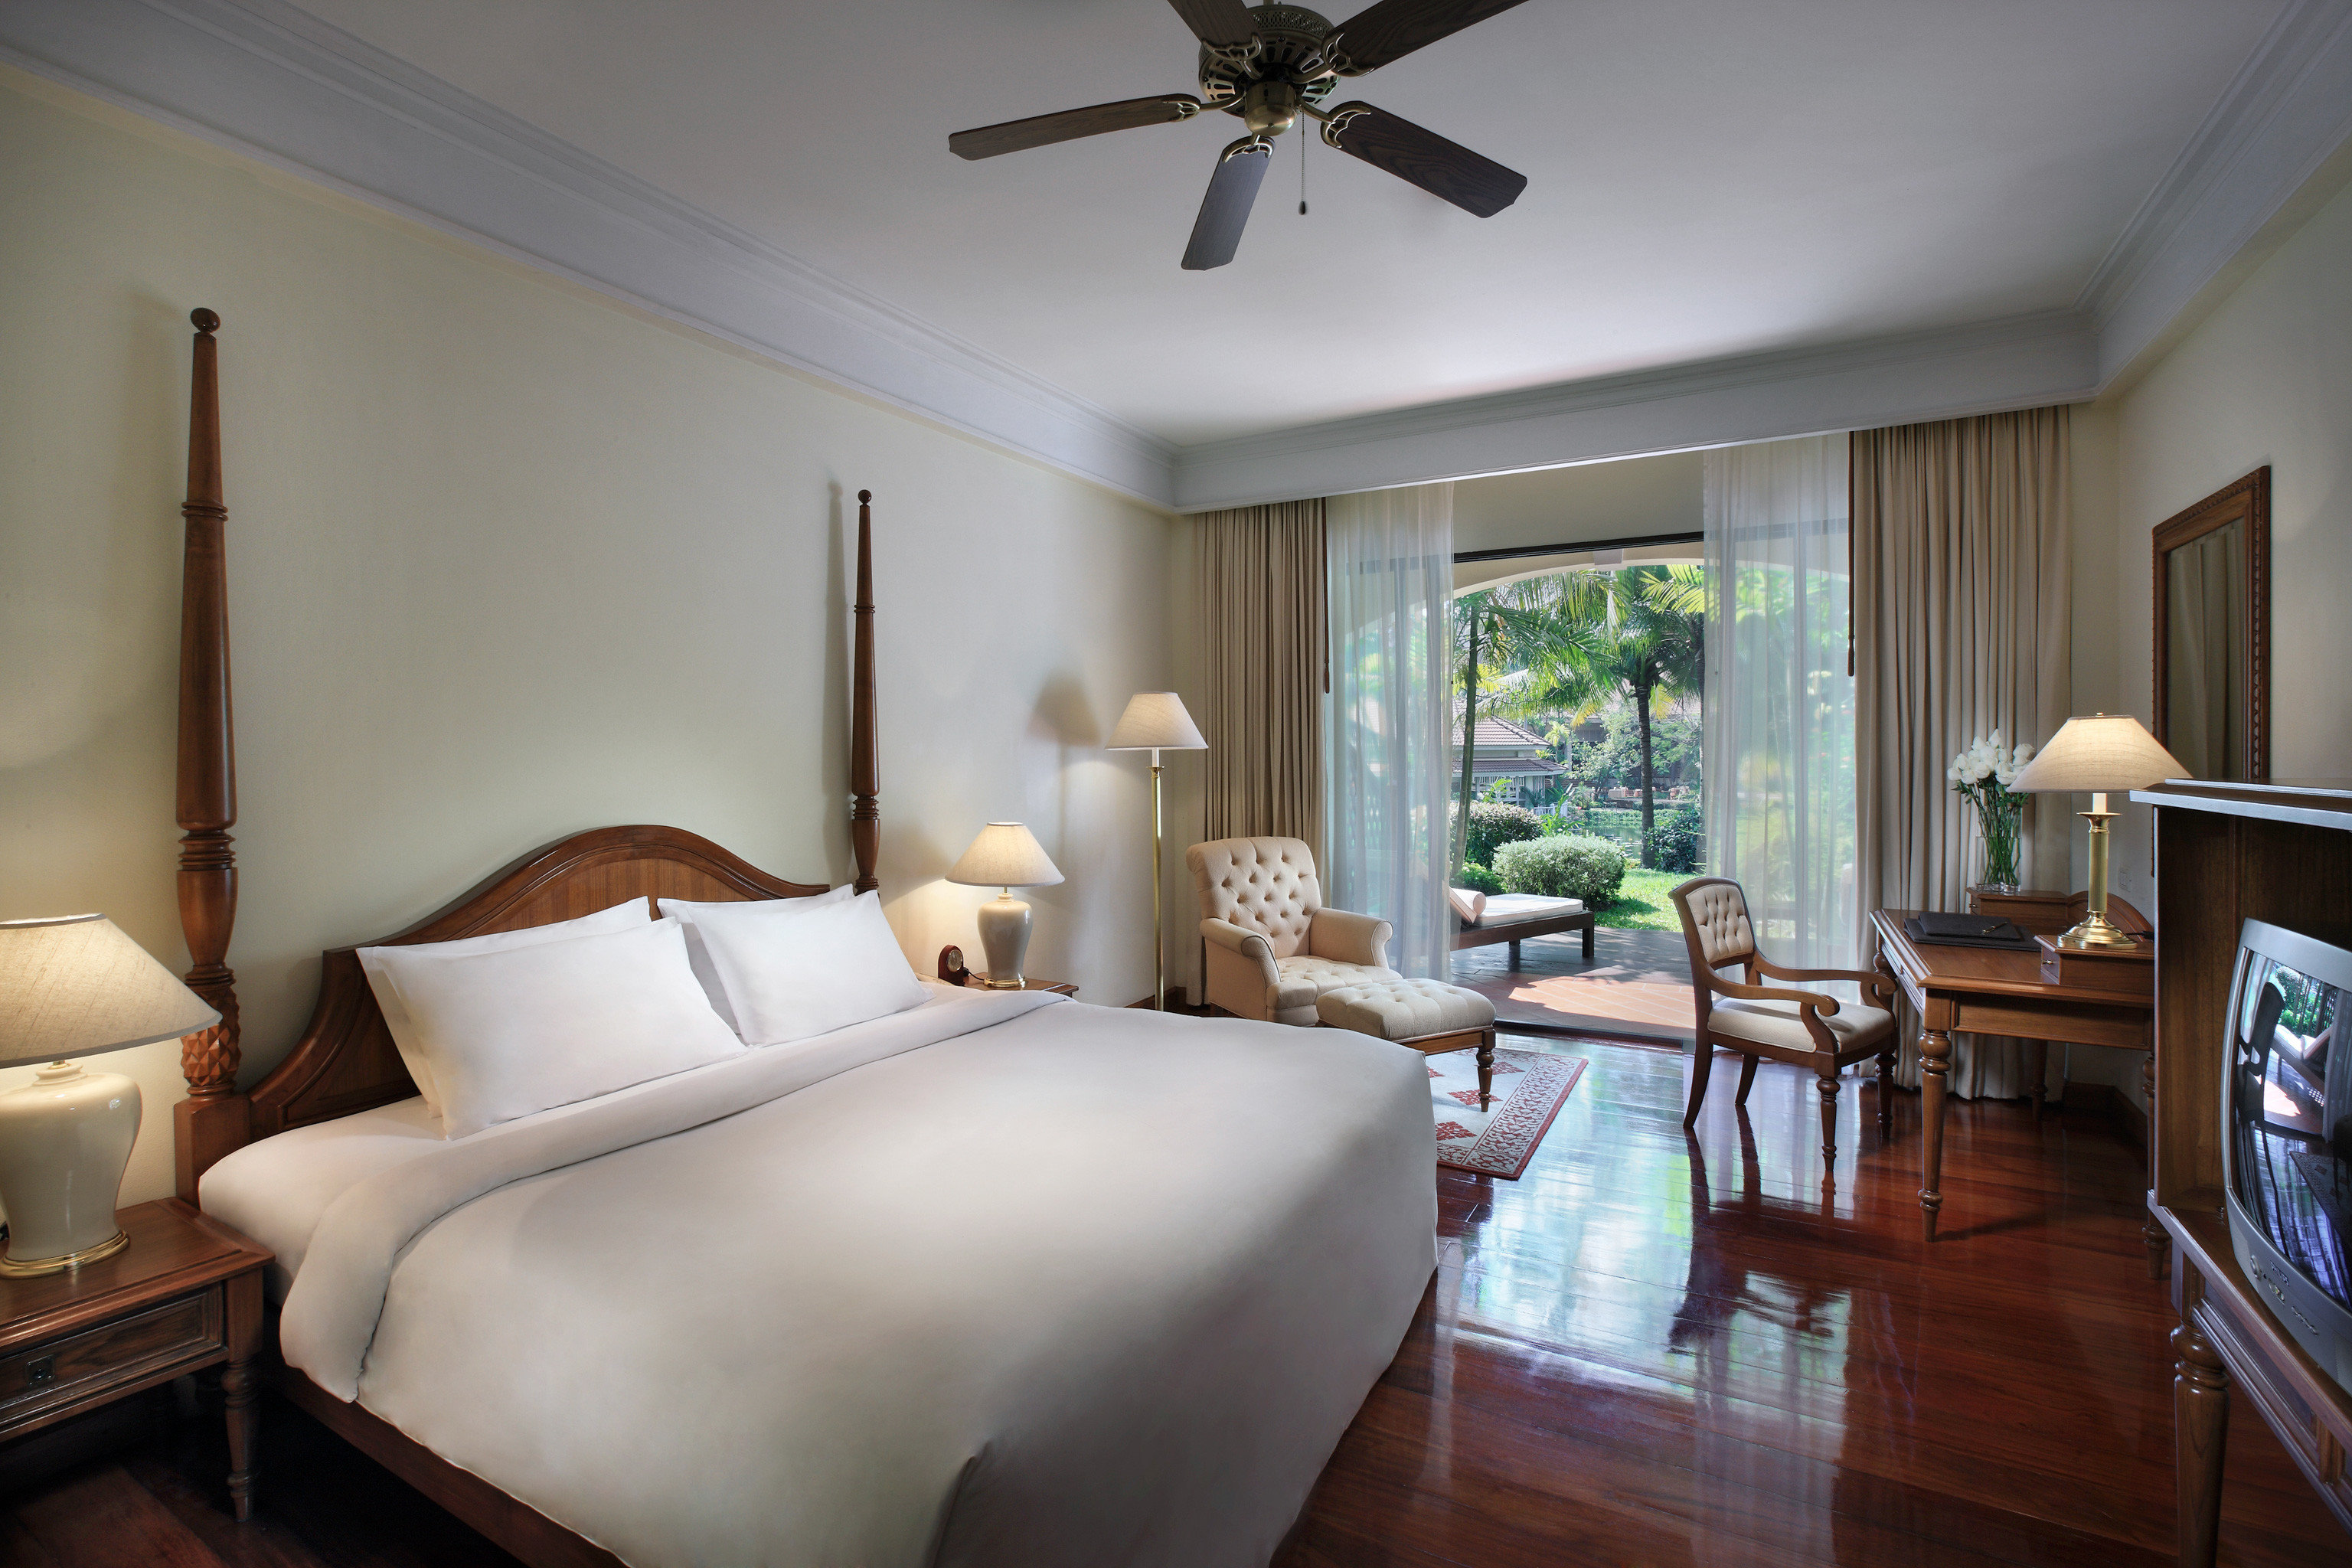 Bedroom Classic Family Patio Resort property living room home cottage hardwood Suite Villa condominium farmhouse